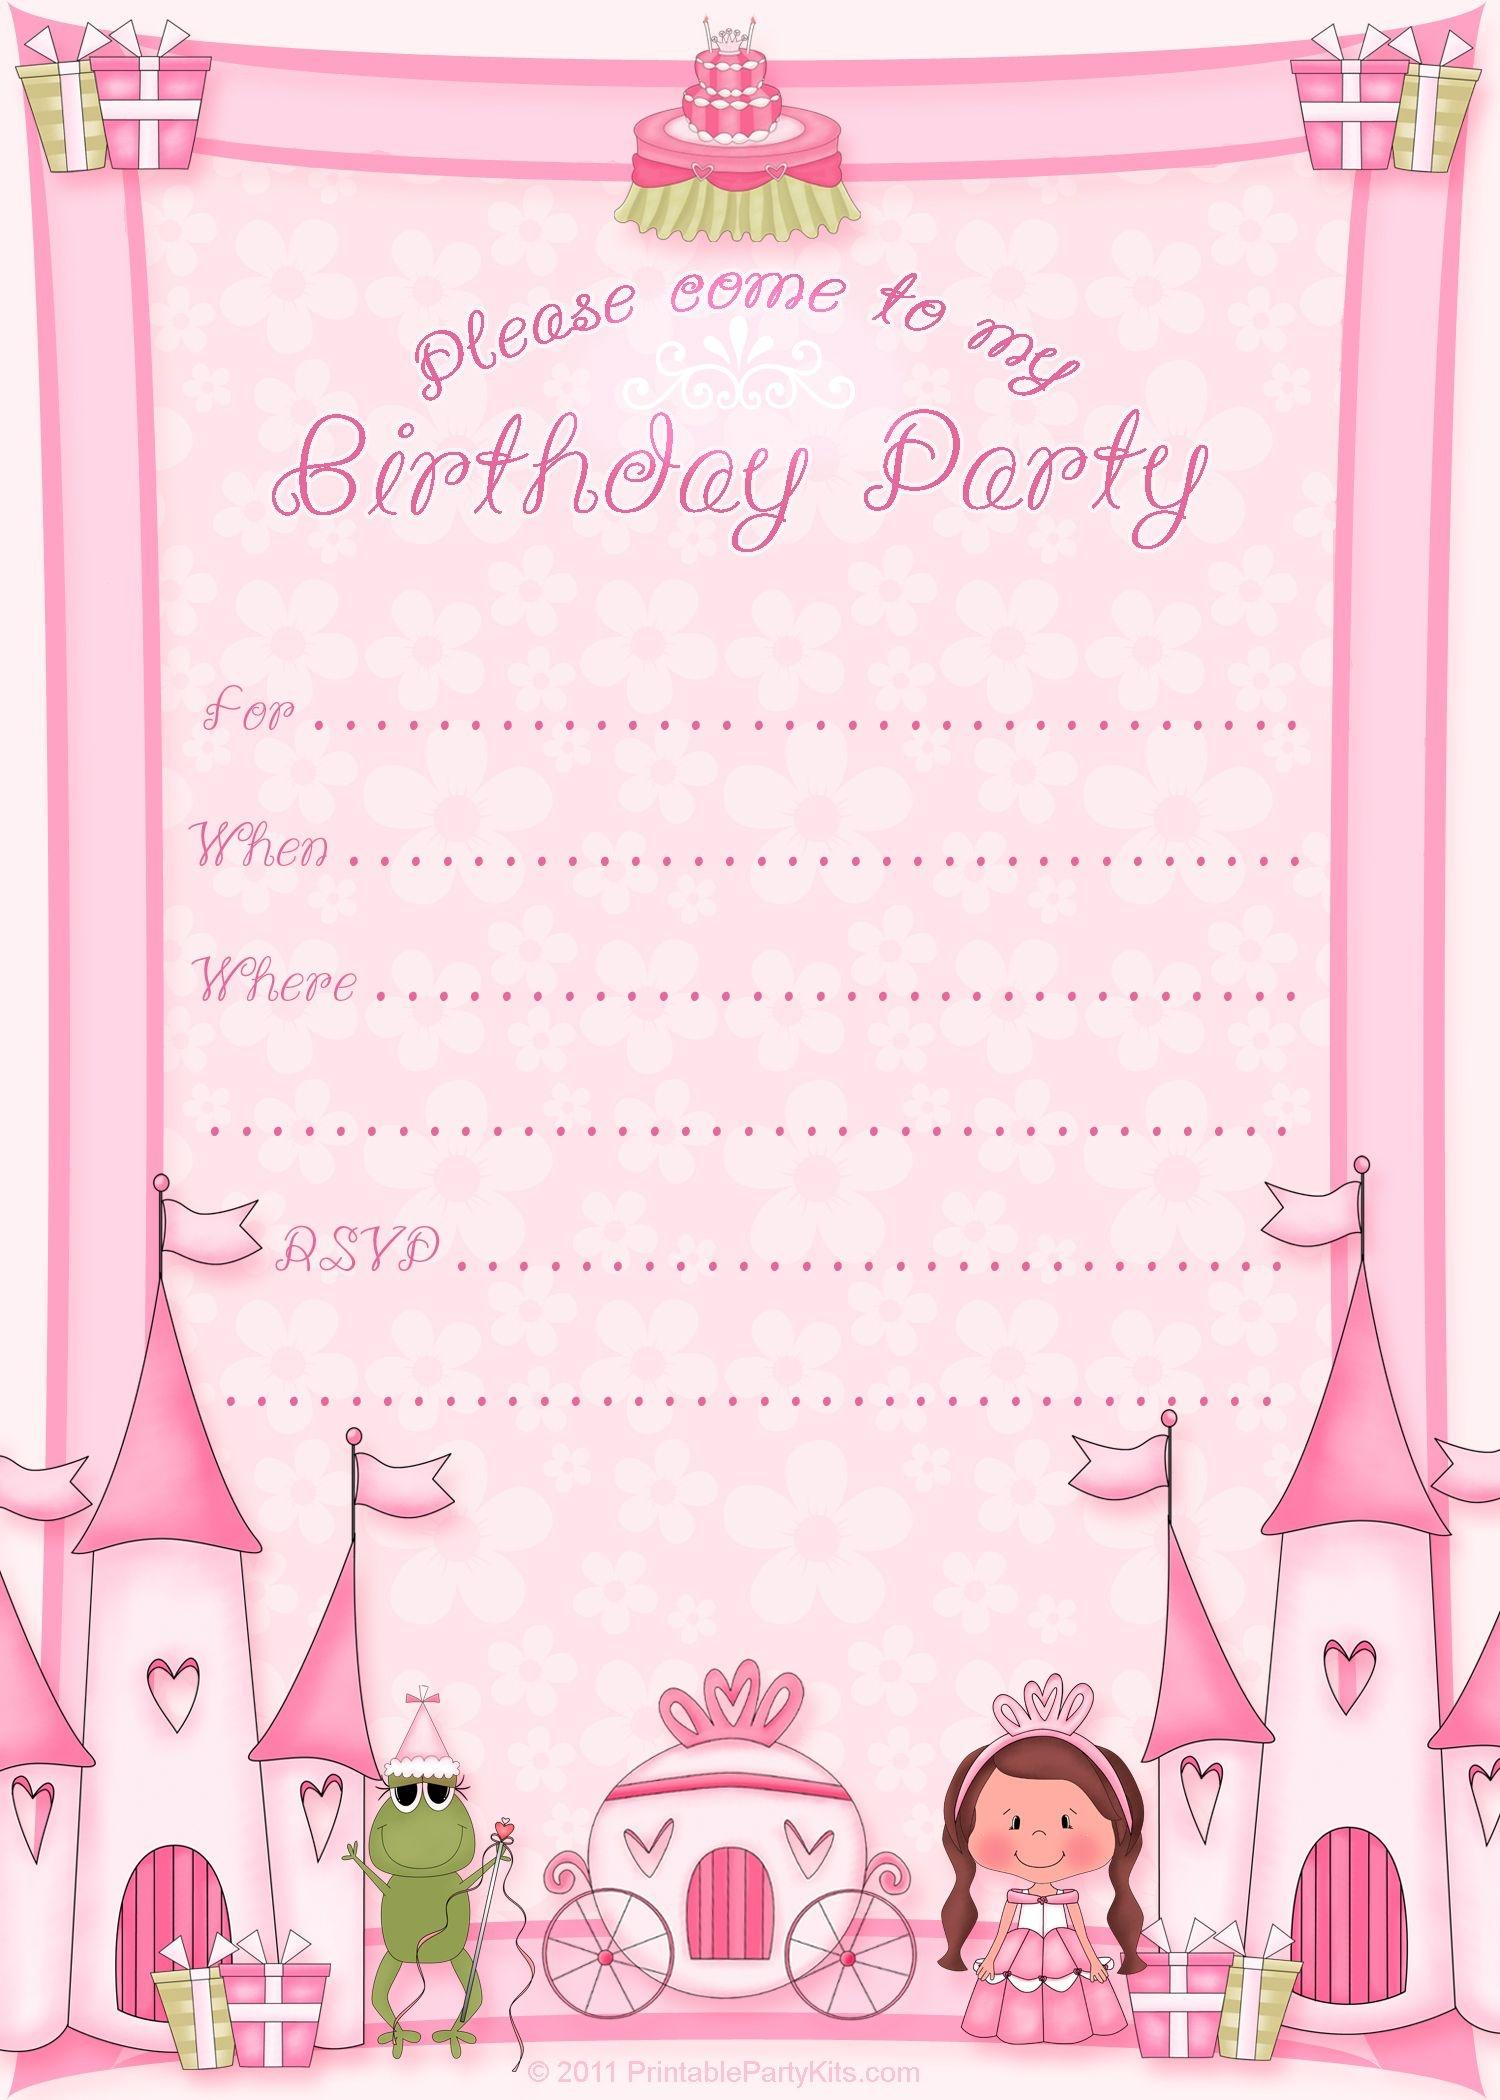 Free Printable Invitation. Pinned For Kidfolio, The Parenting Mobile - Free Printable Princess Invitations